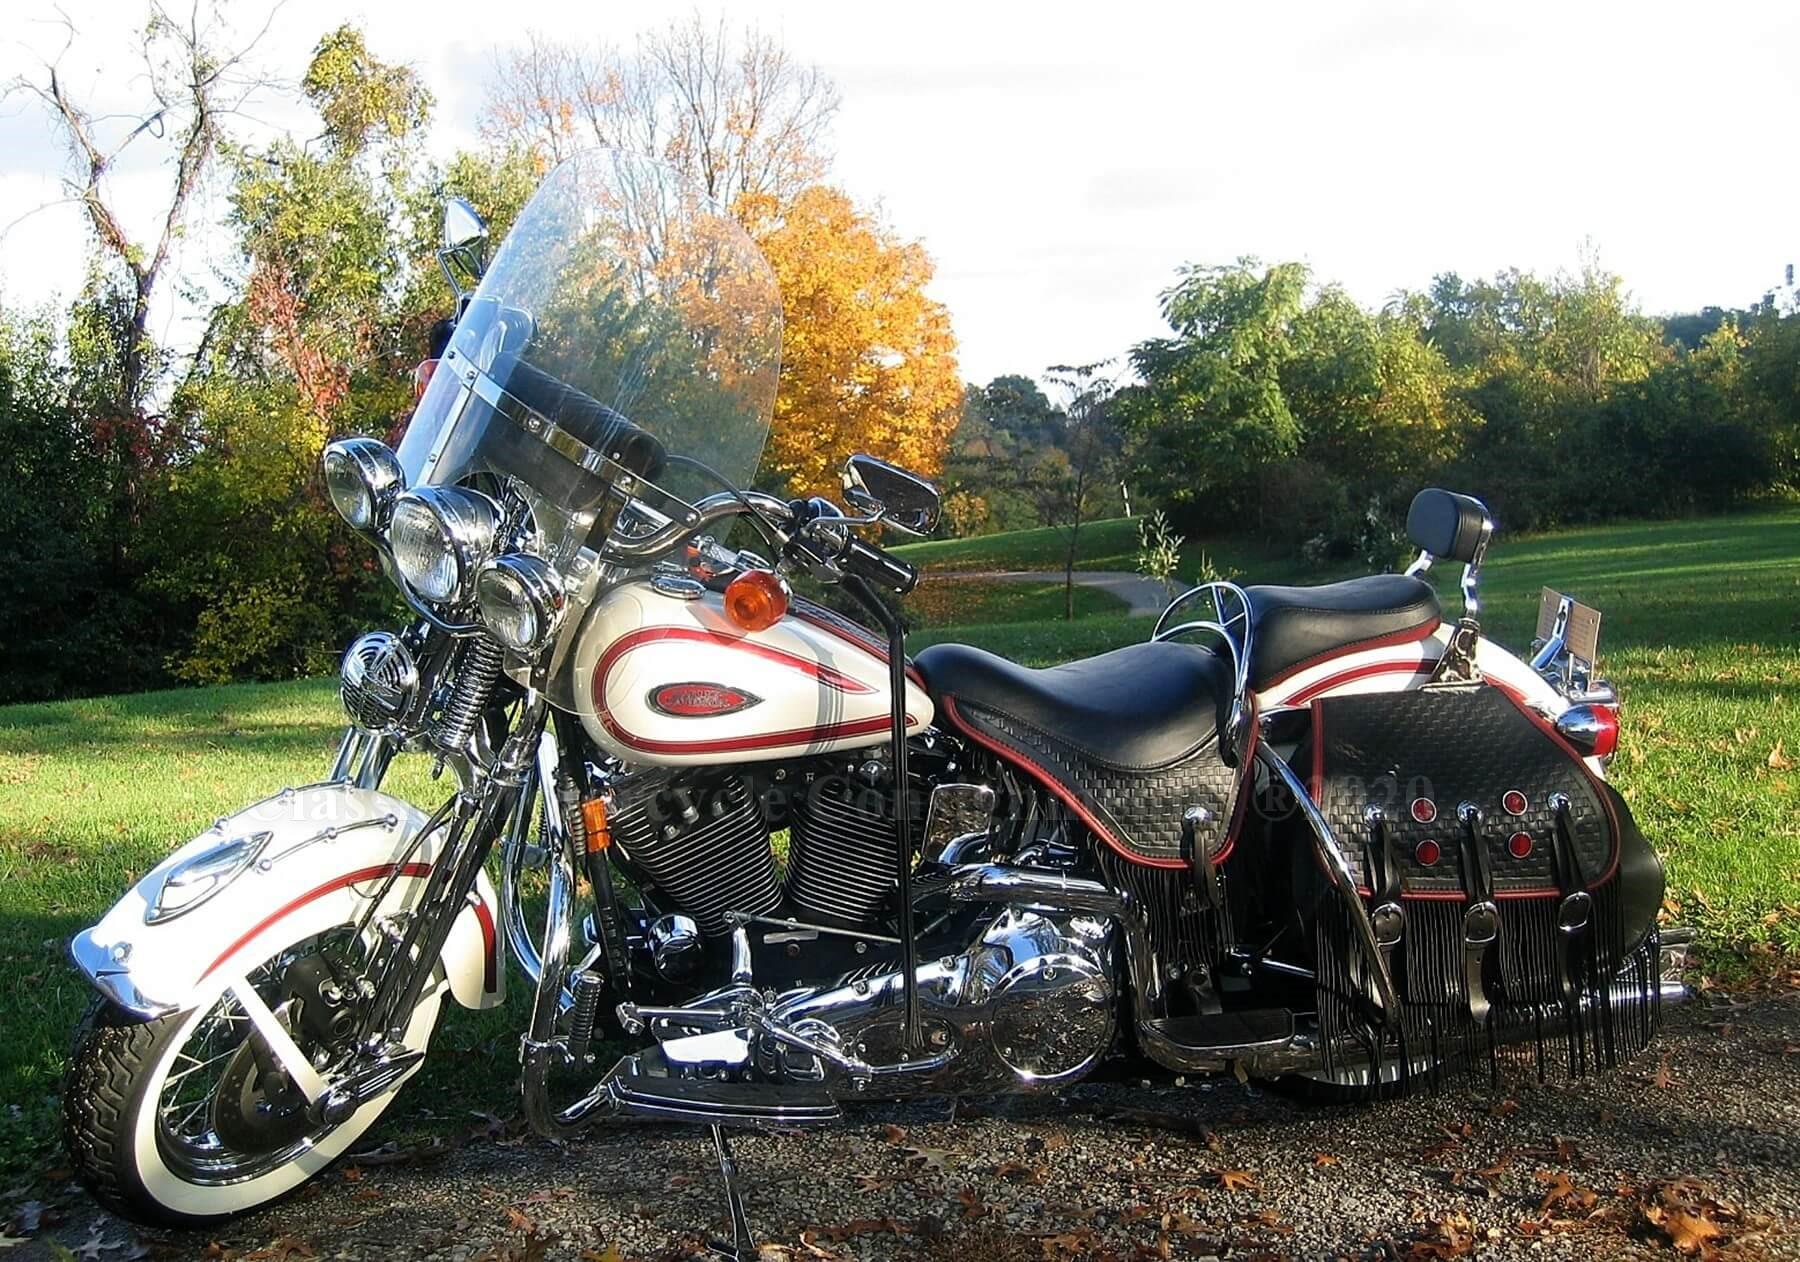 1998 Harley Davidson Softtail